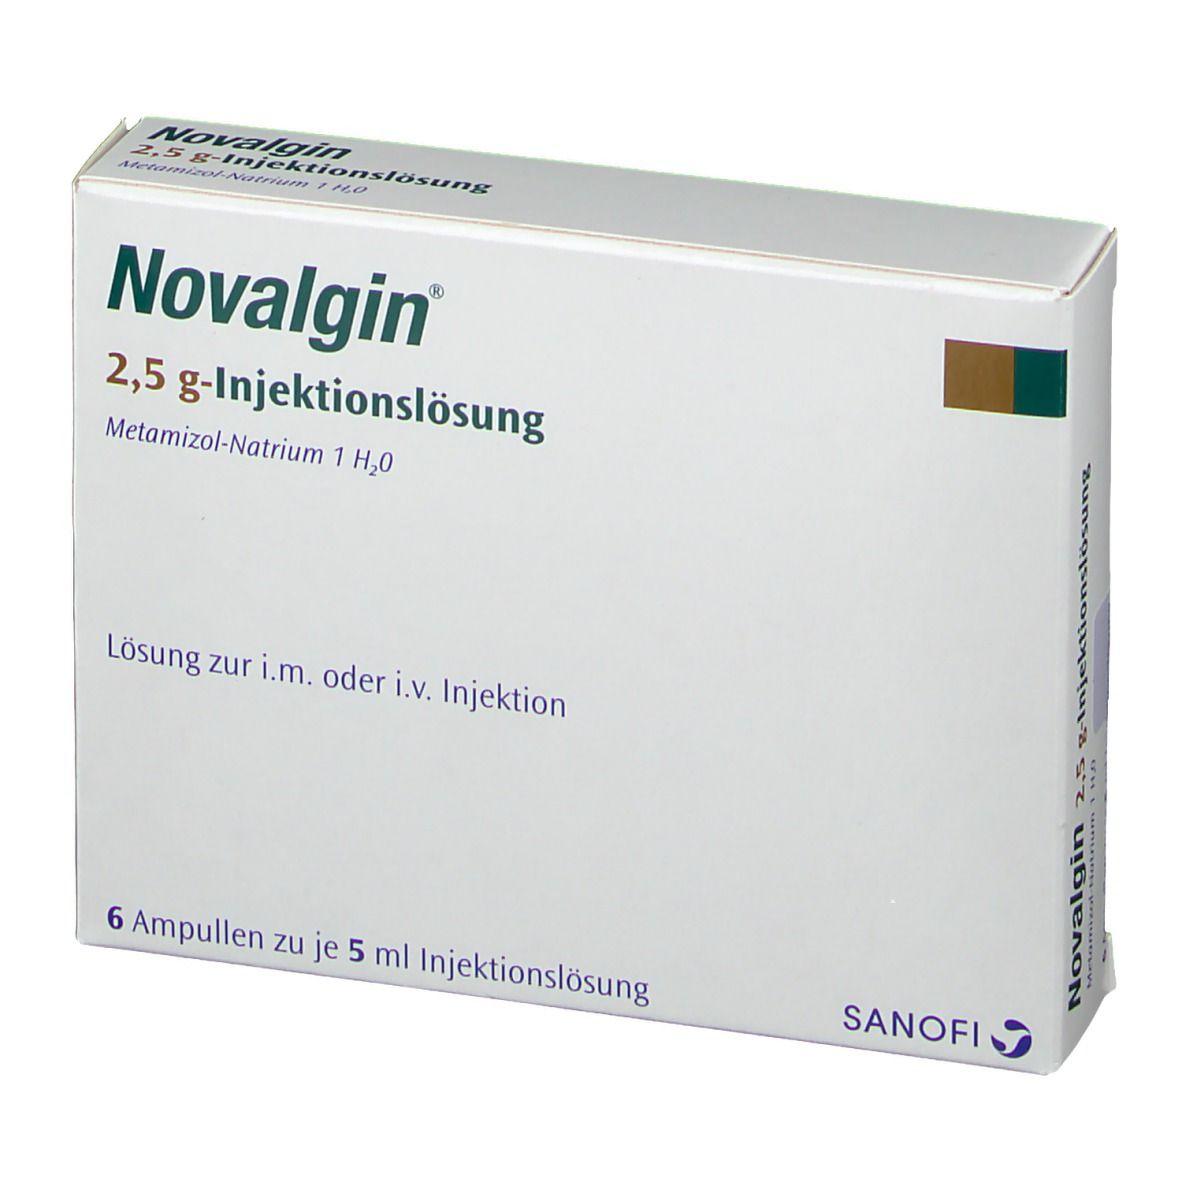 Ibuprofen gleichzeitig novalgin Novalgin